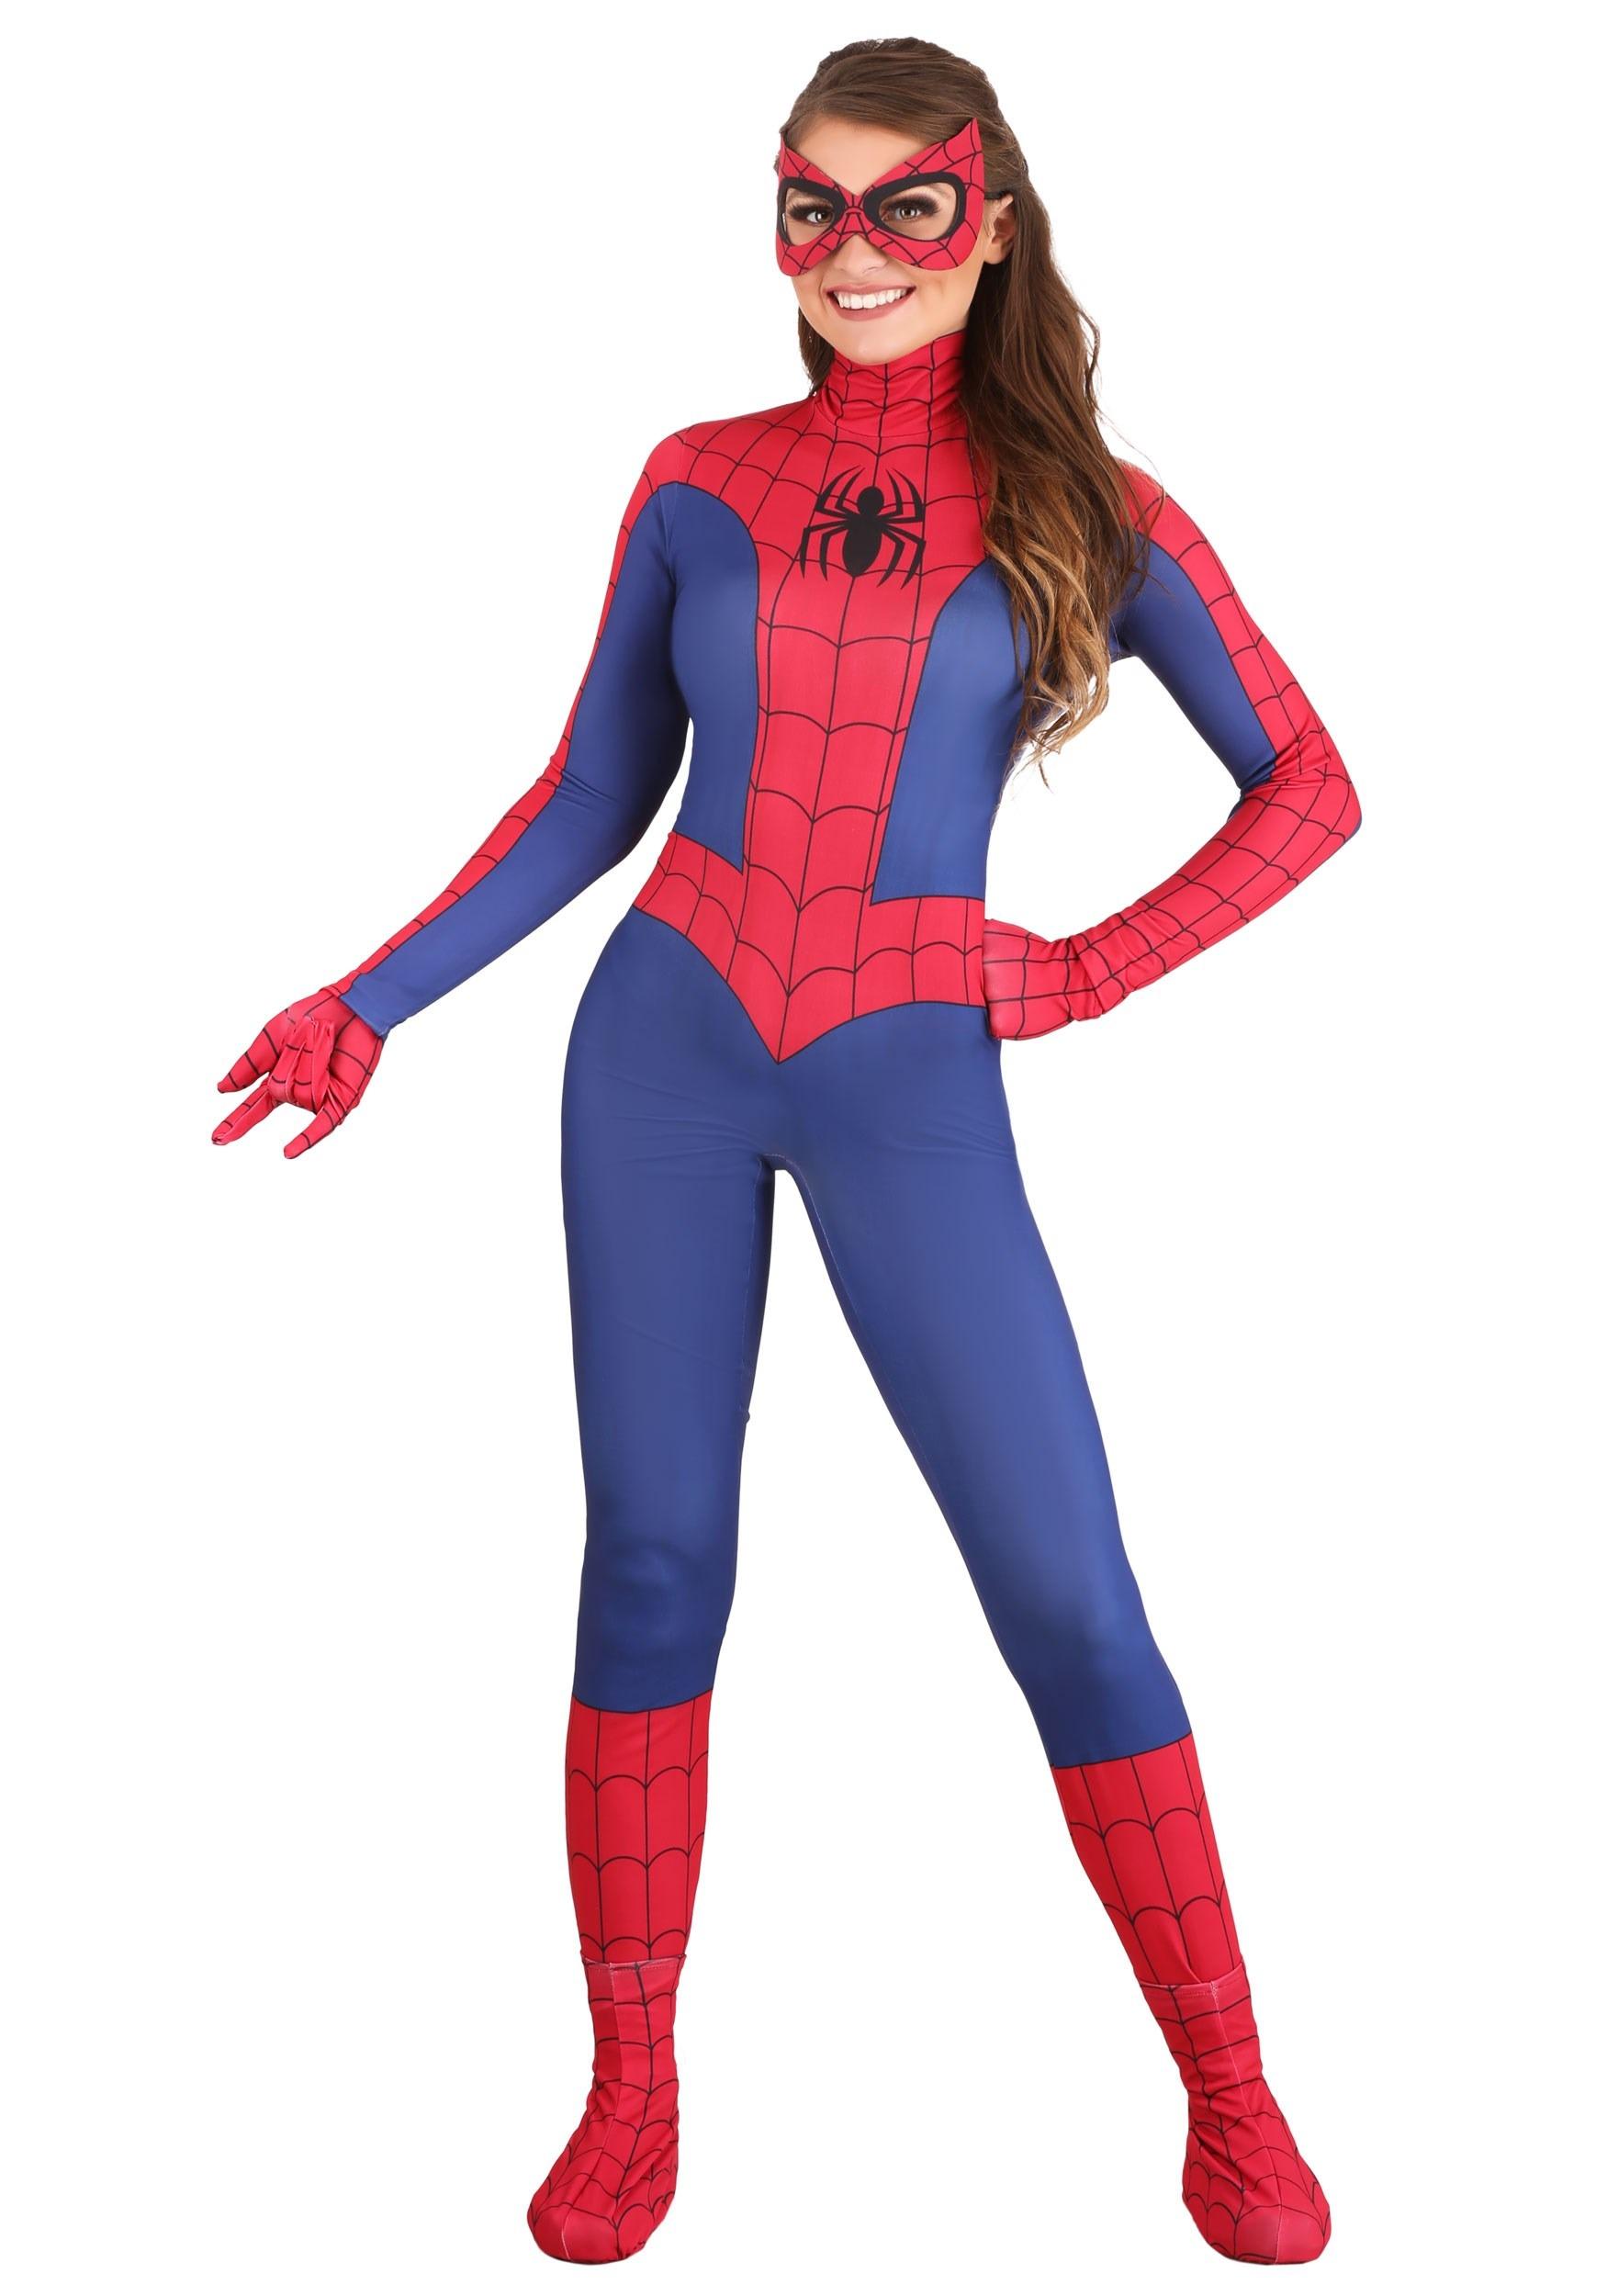 Spider-Man Costume for Women | Spider Girl Costume